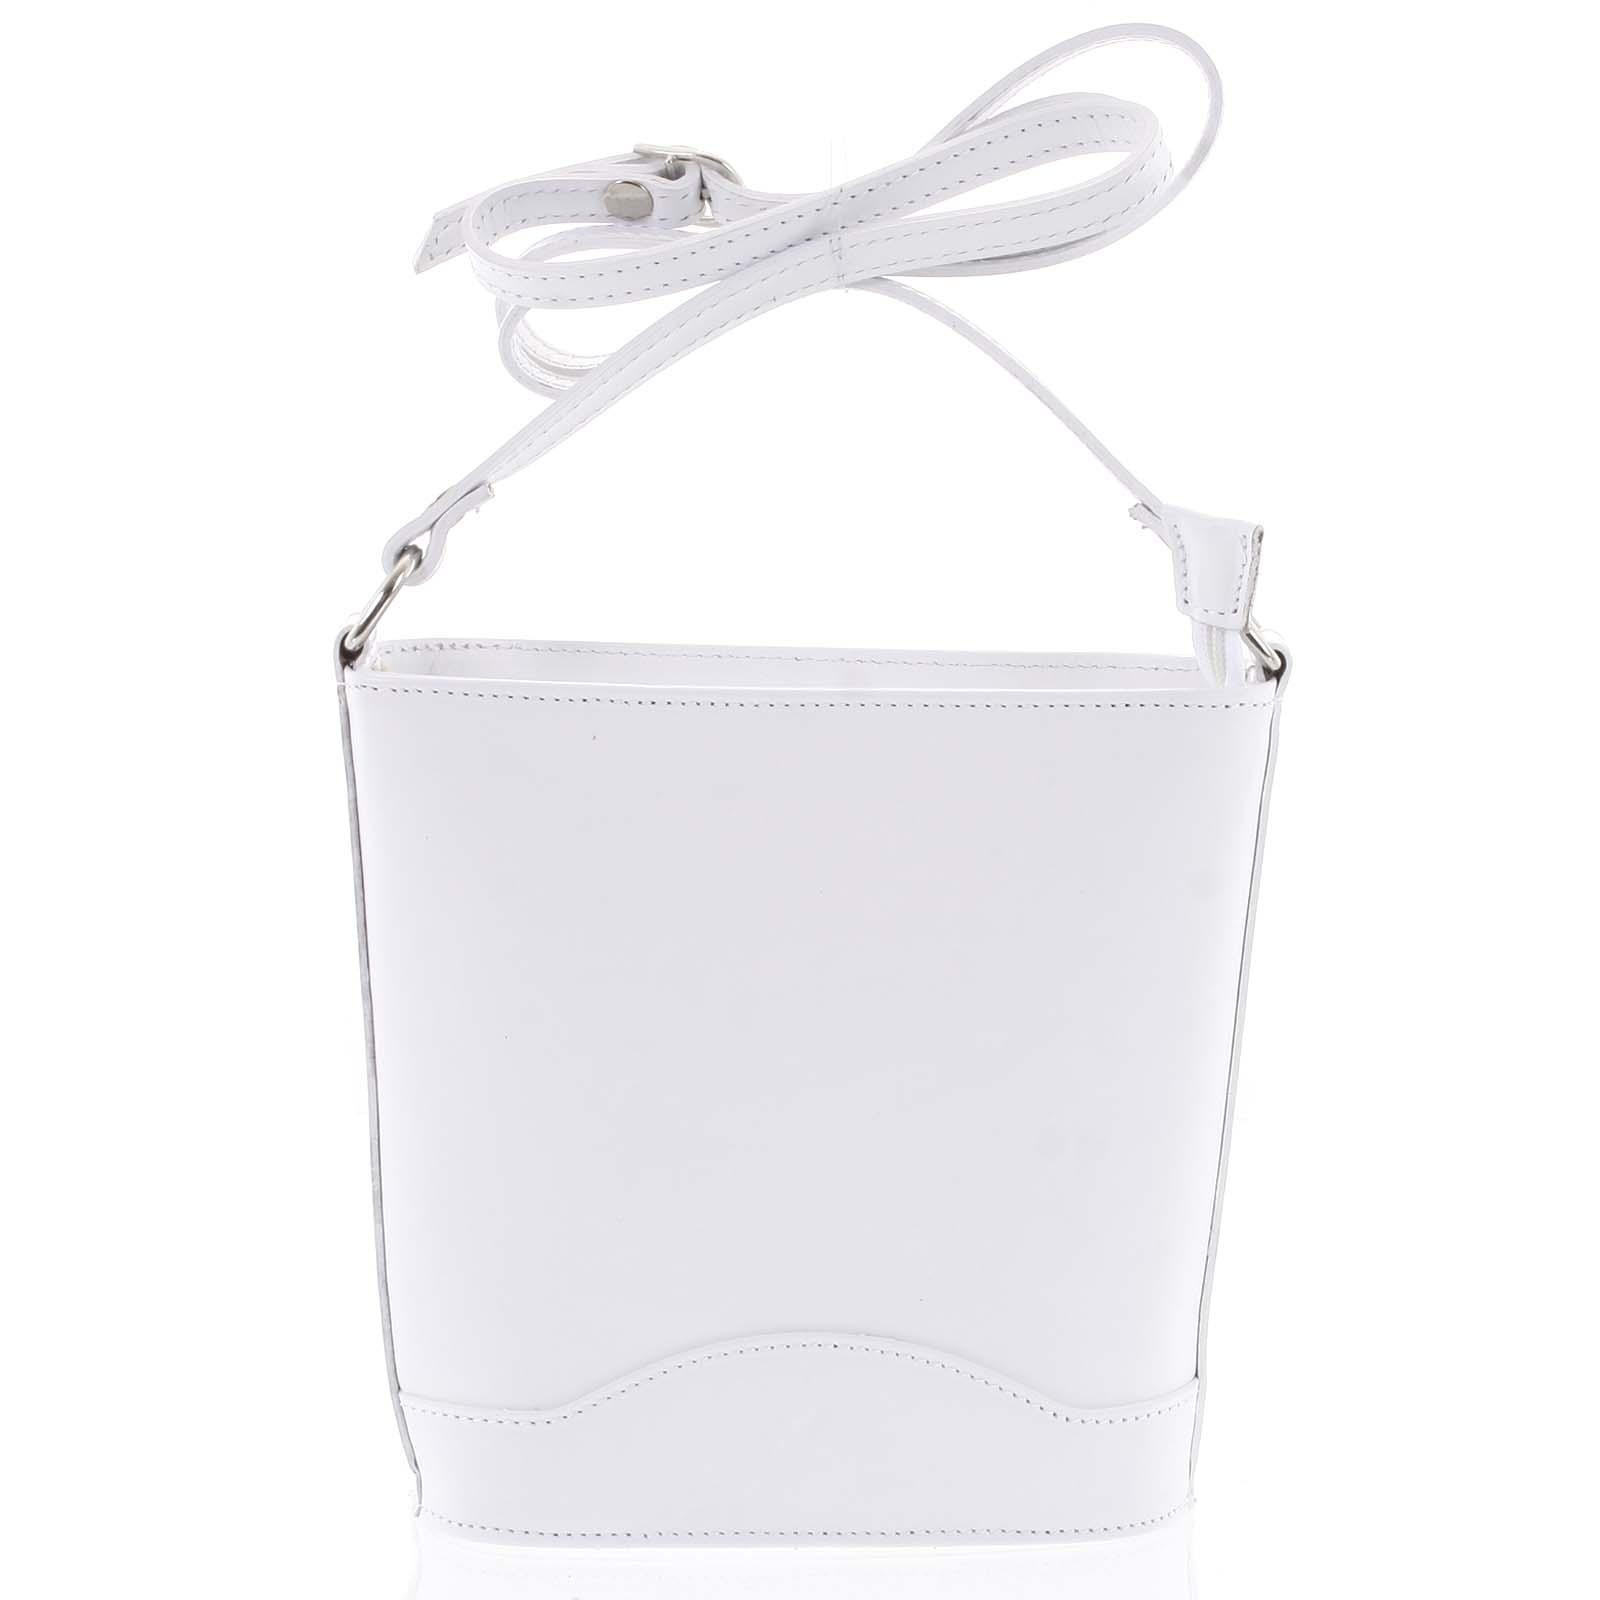 Bílá kožená crossbody kabelka ItalY Bryana Light